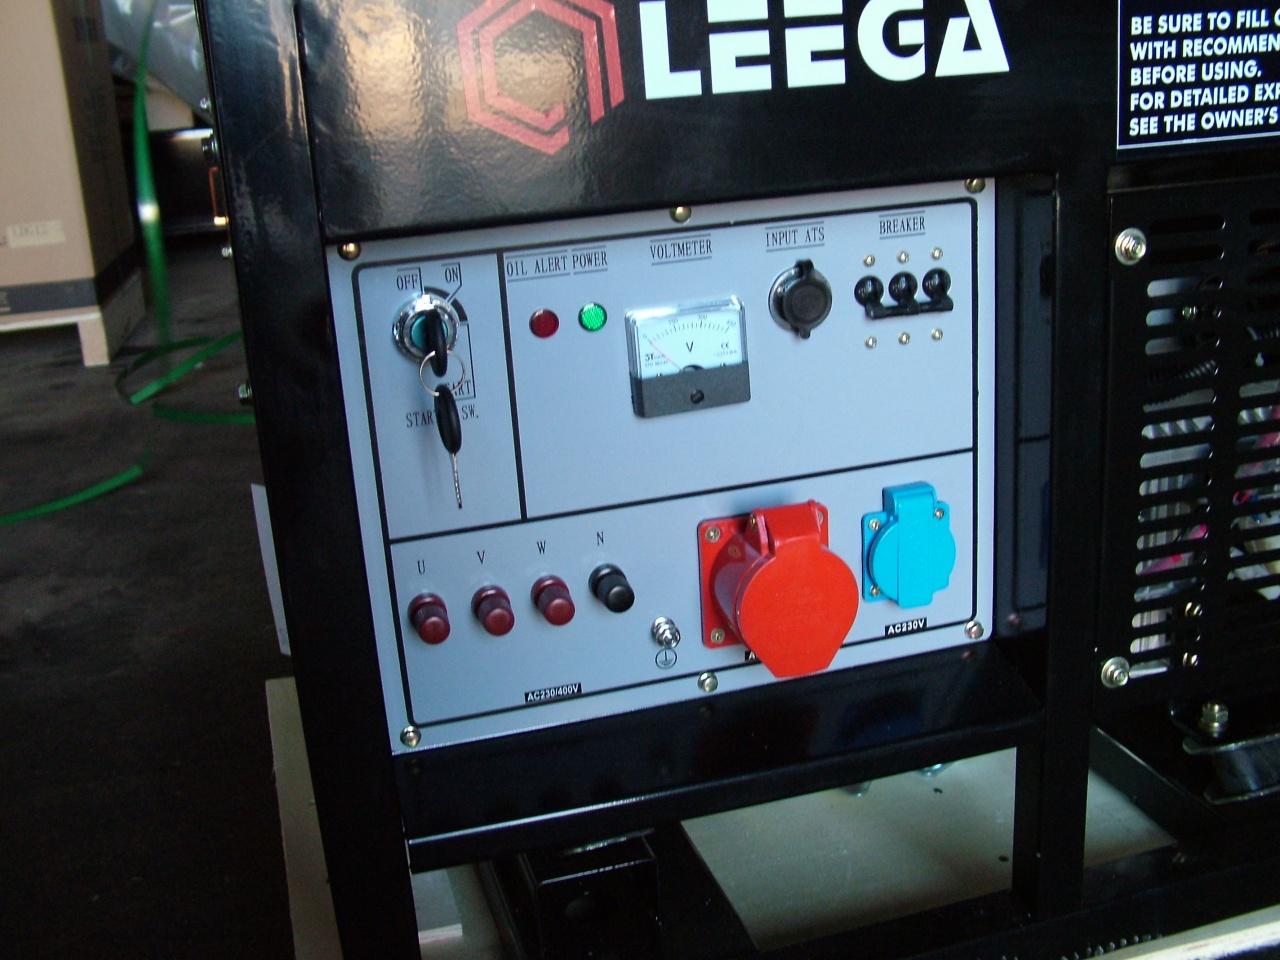 дизельная электростанция амперос ldg12 e